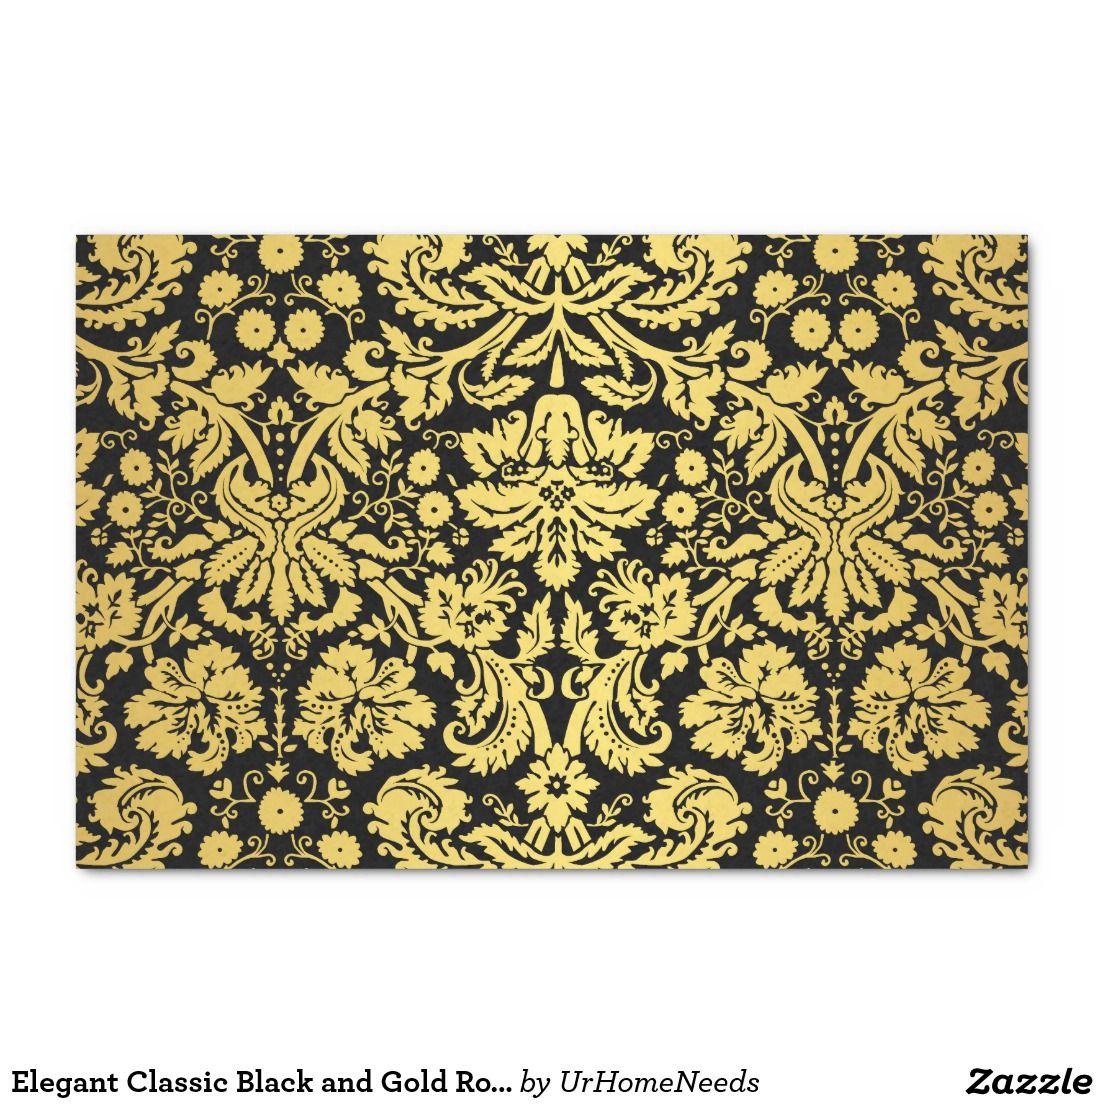 "Elegant Classic Black and Gold Royal Damask 10"" X 15"" Tissue Paper"